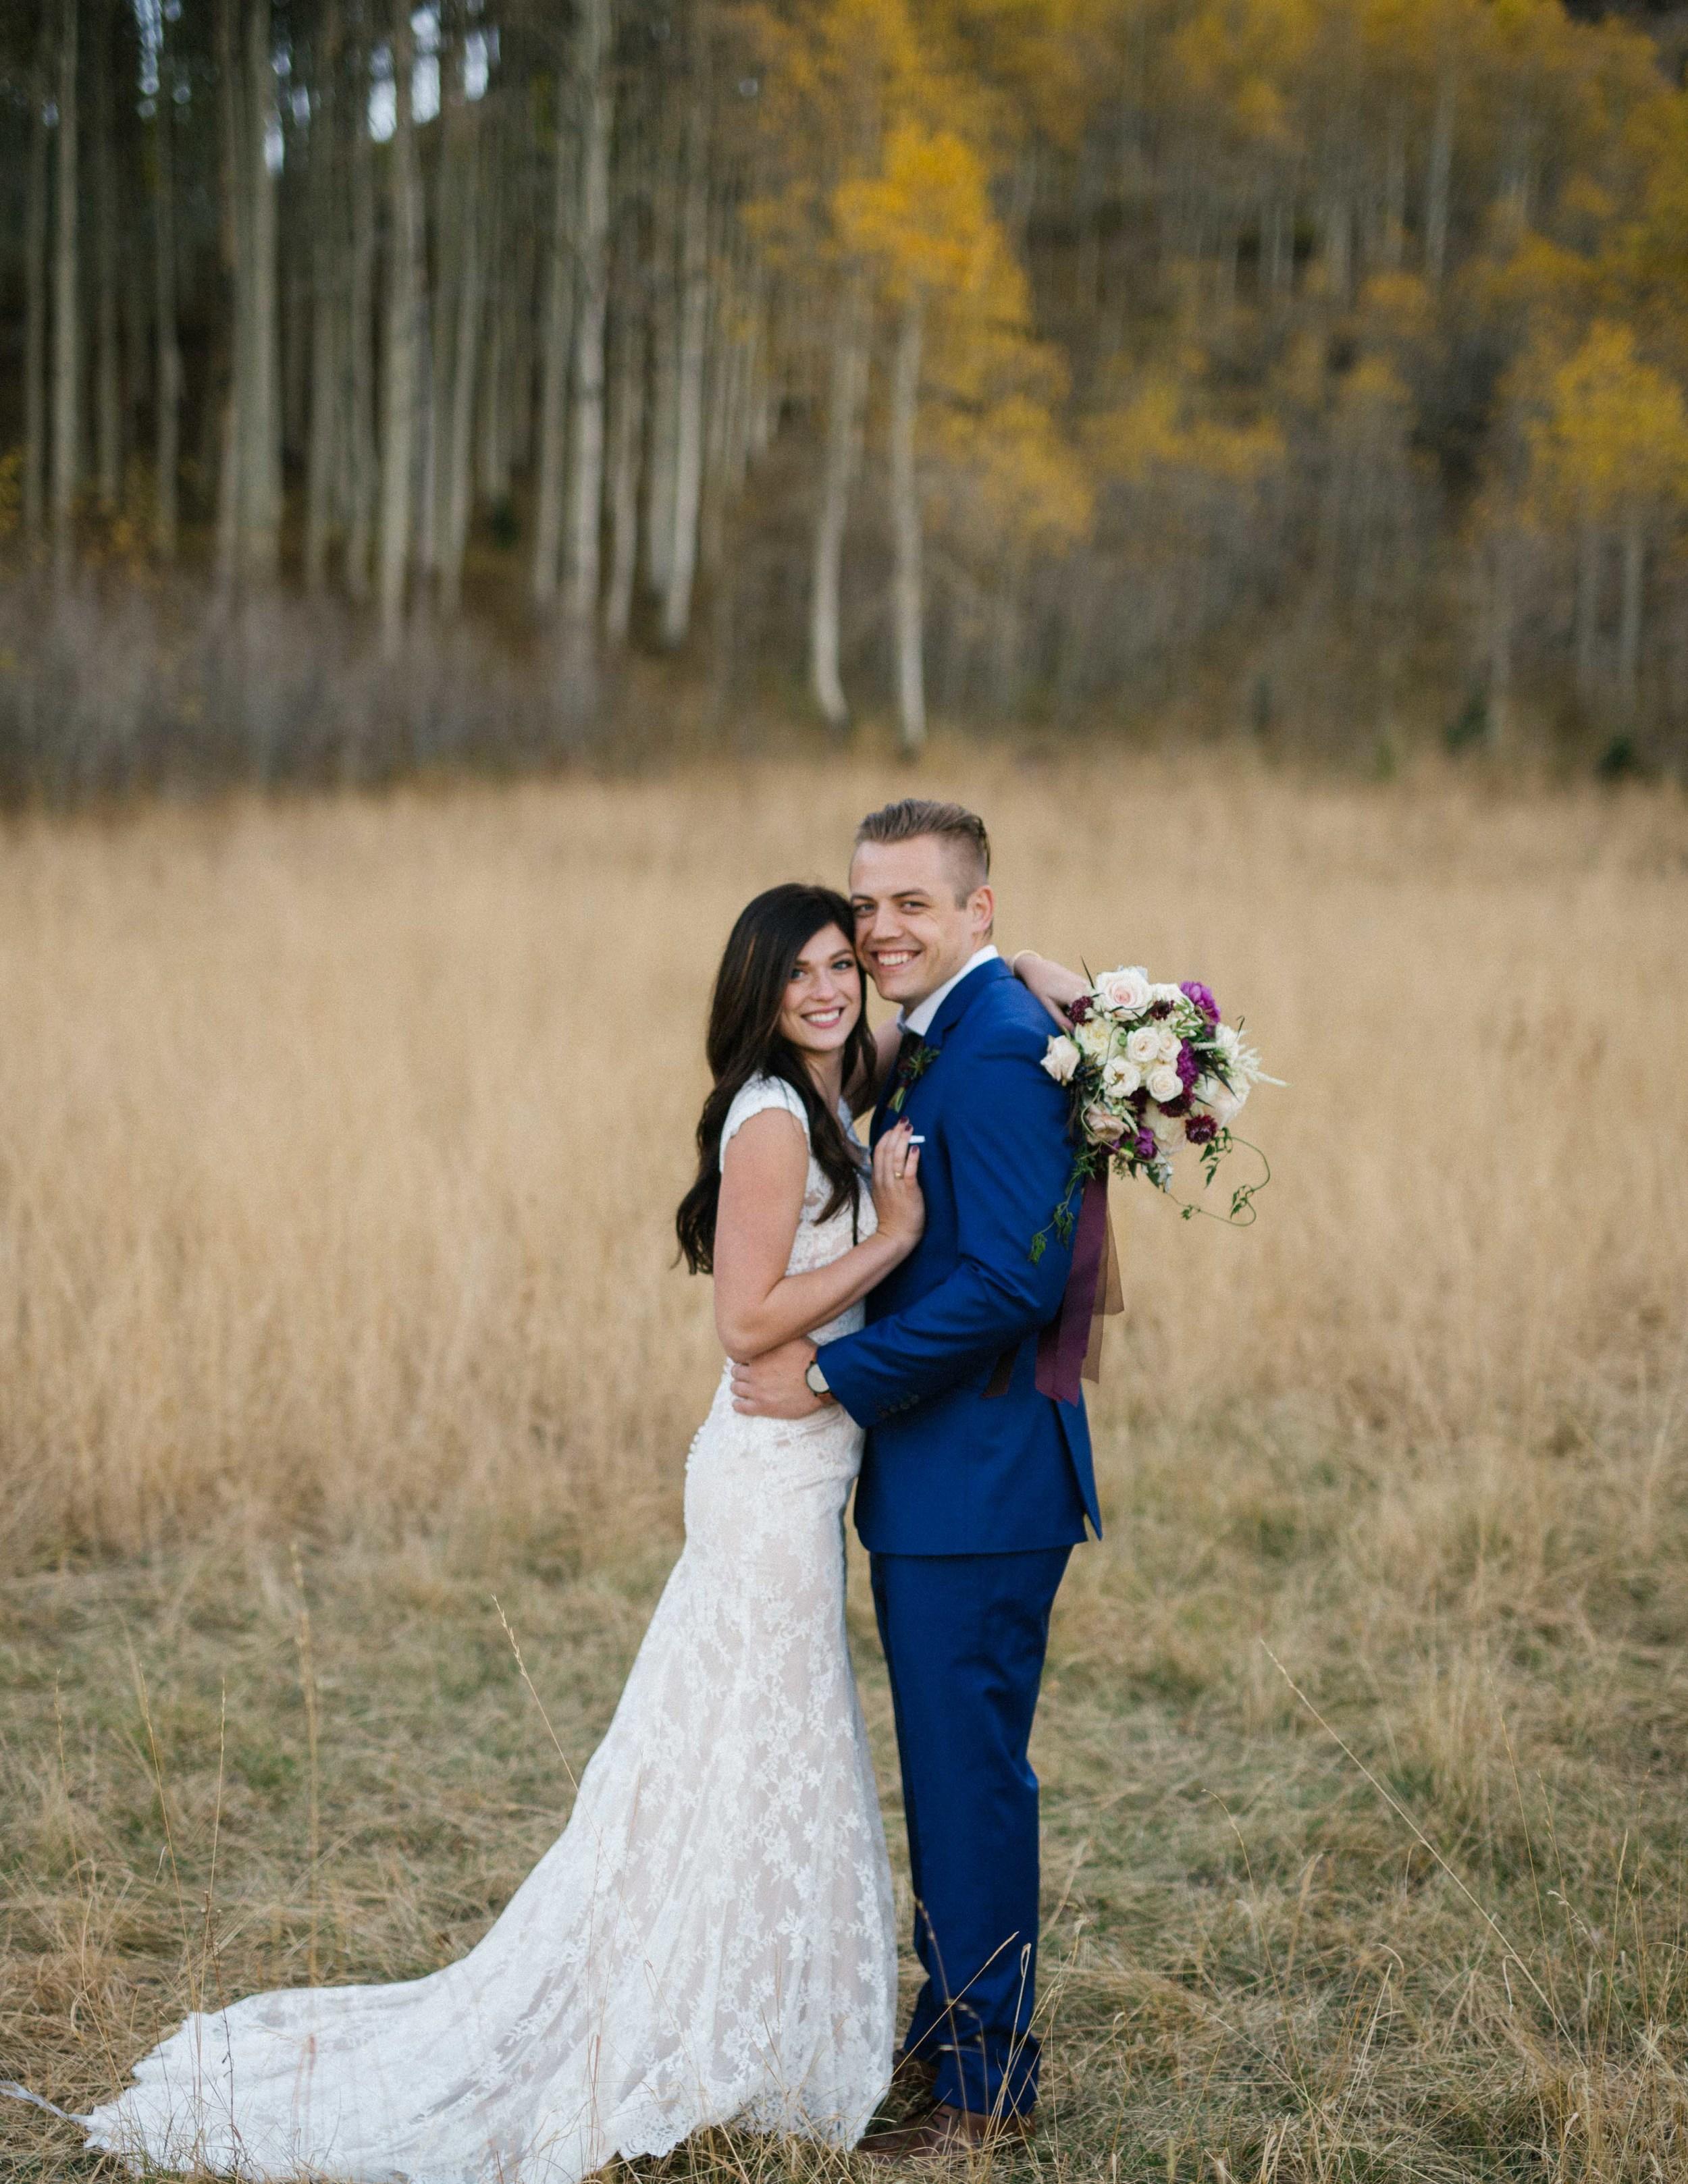 Salt-Lake-City-Wedding-Photographer-12.jpg